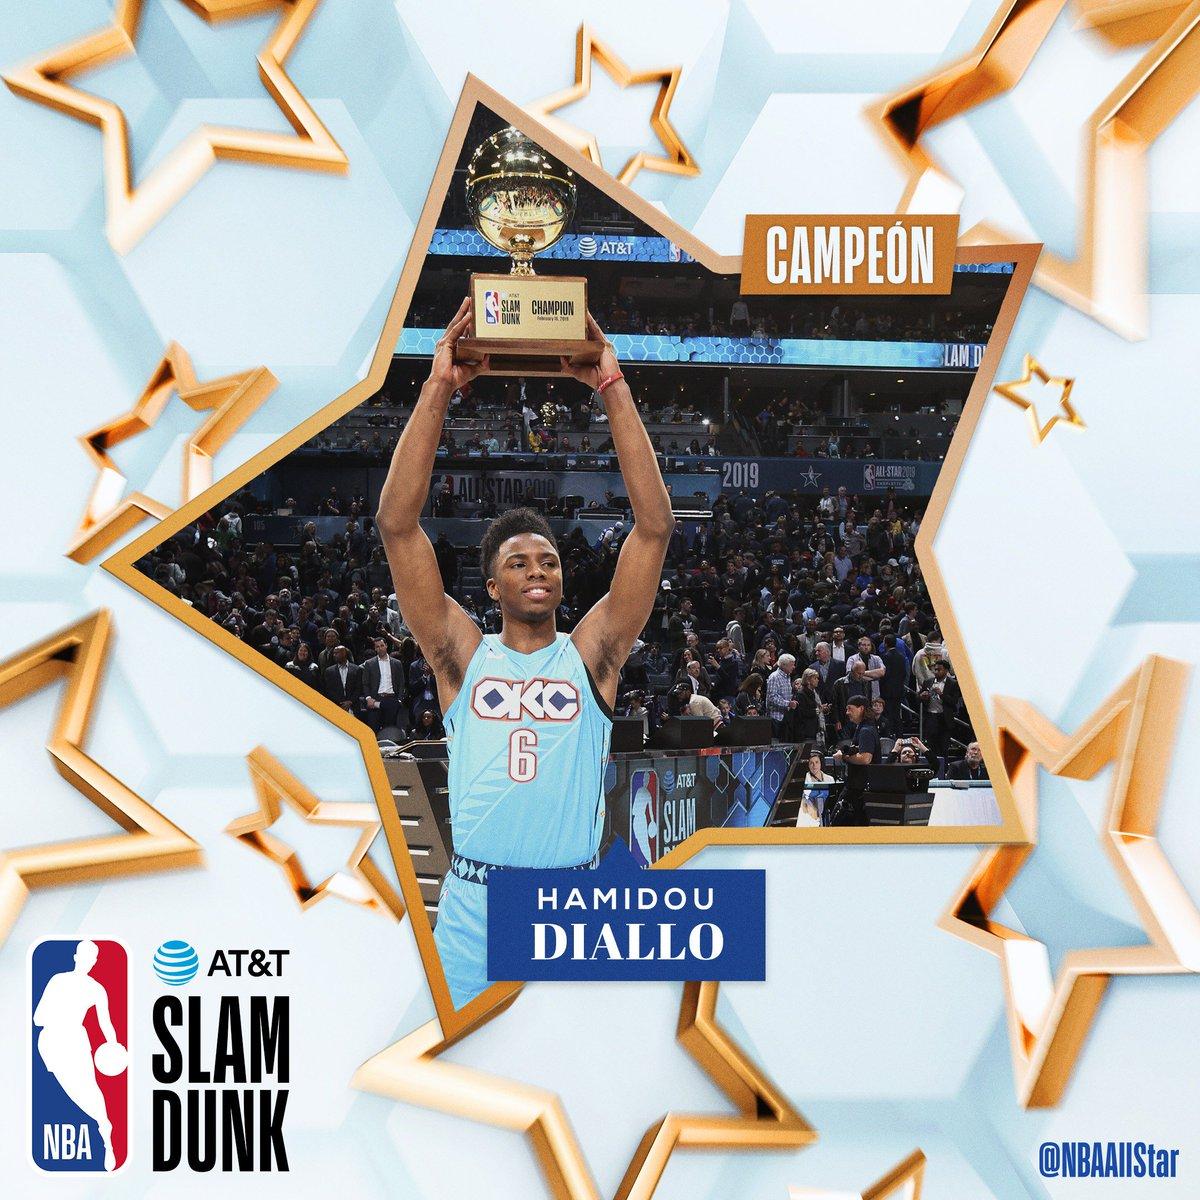 ¡Felicitaciones @hamidoudiallo campeón del concurso de mates!😱🤩 #ATTSlamDunk #NBAAllStar @okcthunder